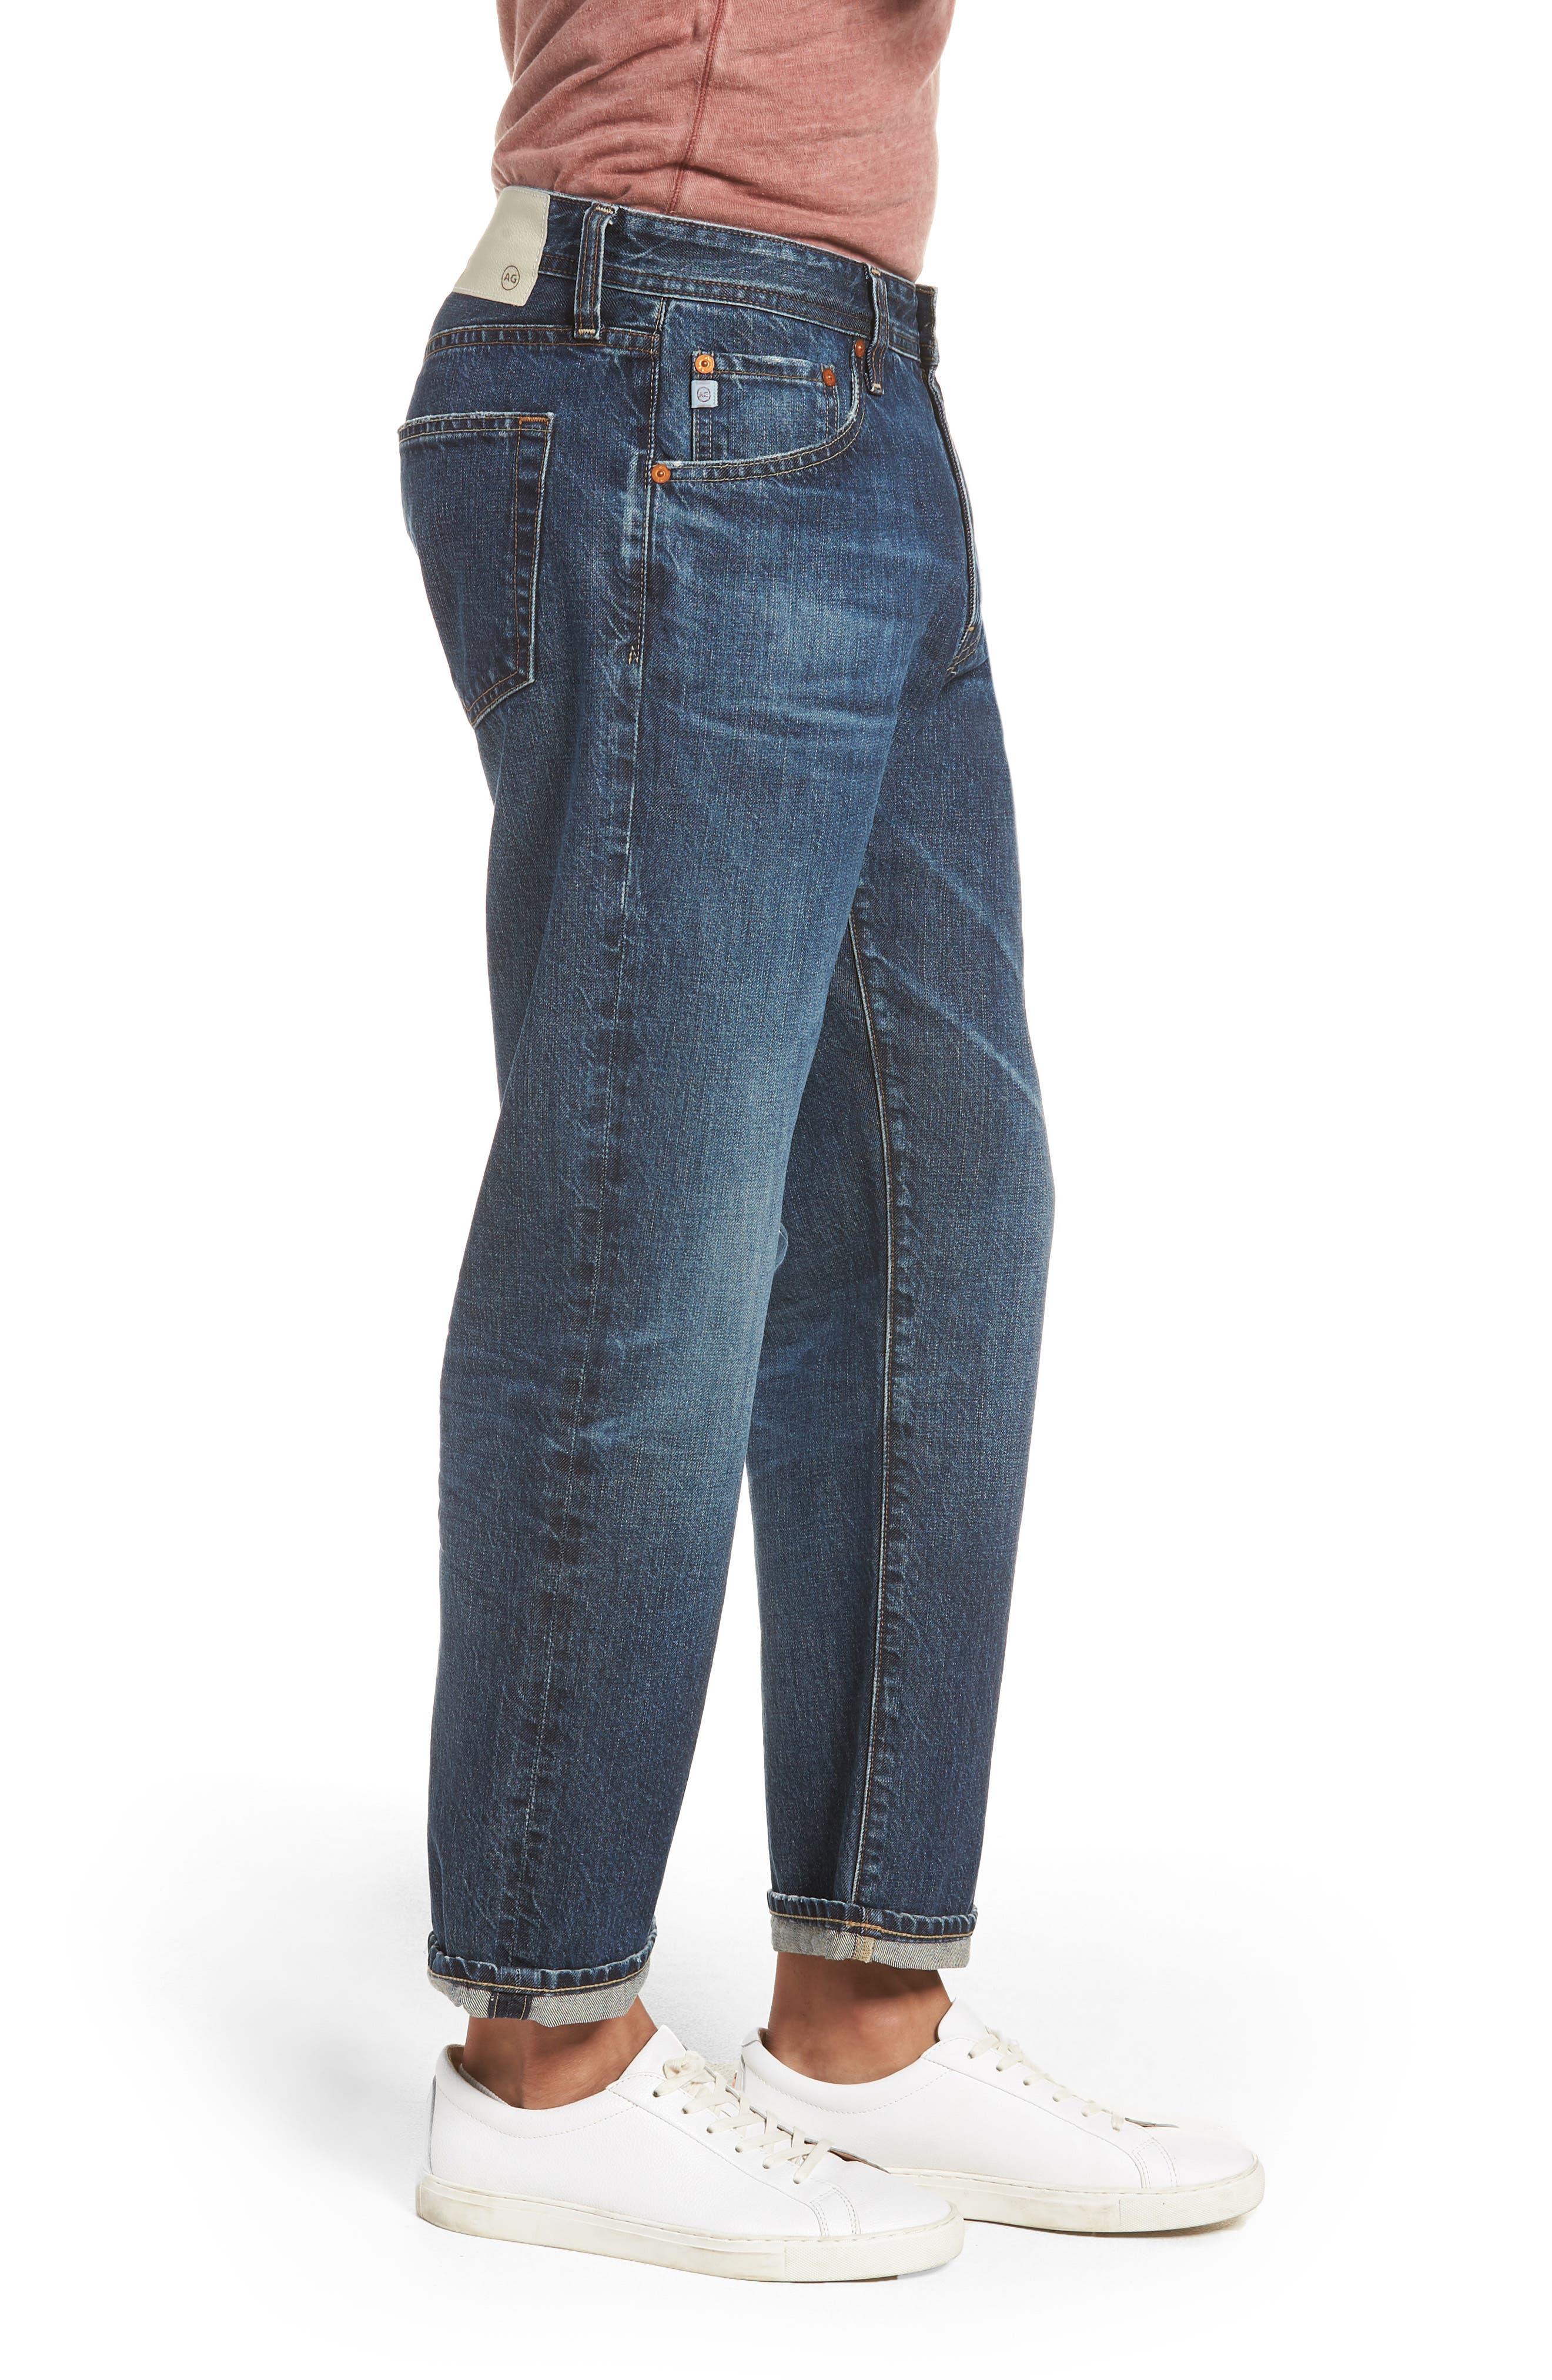 Turner Crop Jeans,                             Alternate thumbnail 3, color,                             5 YEARS WAYFARER